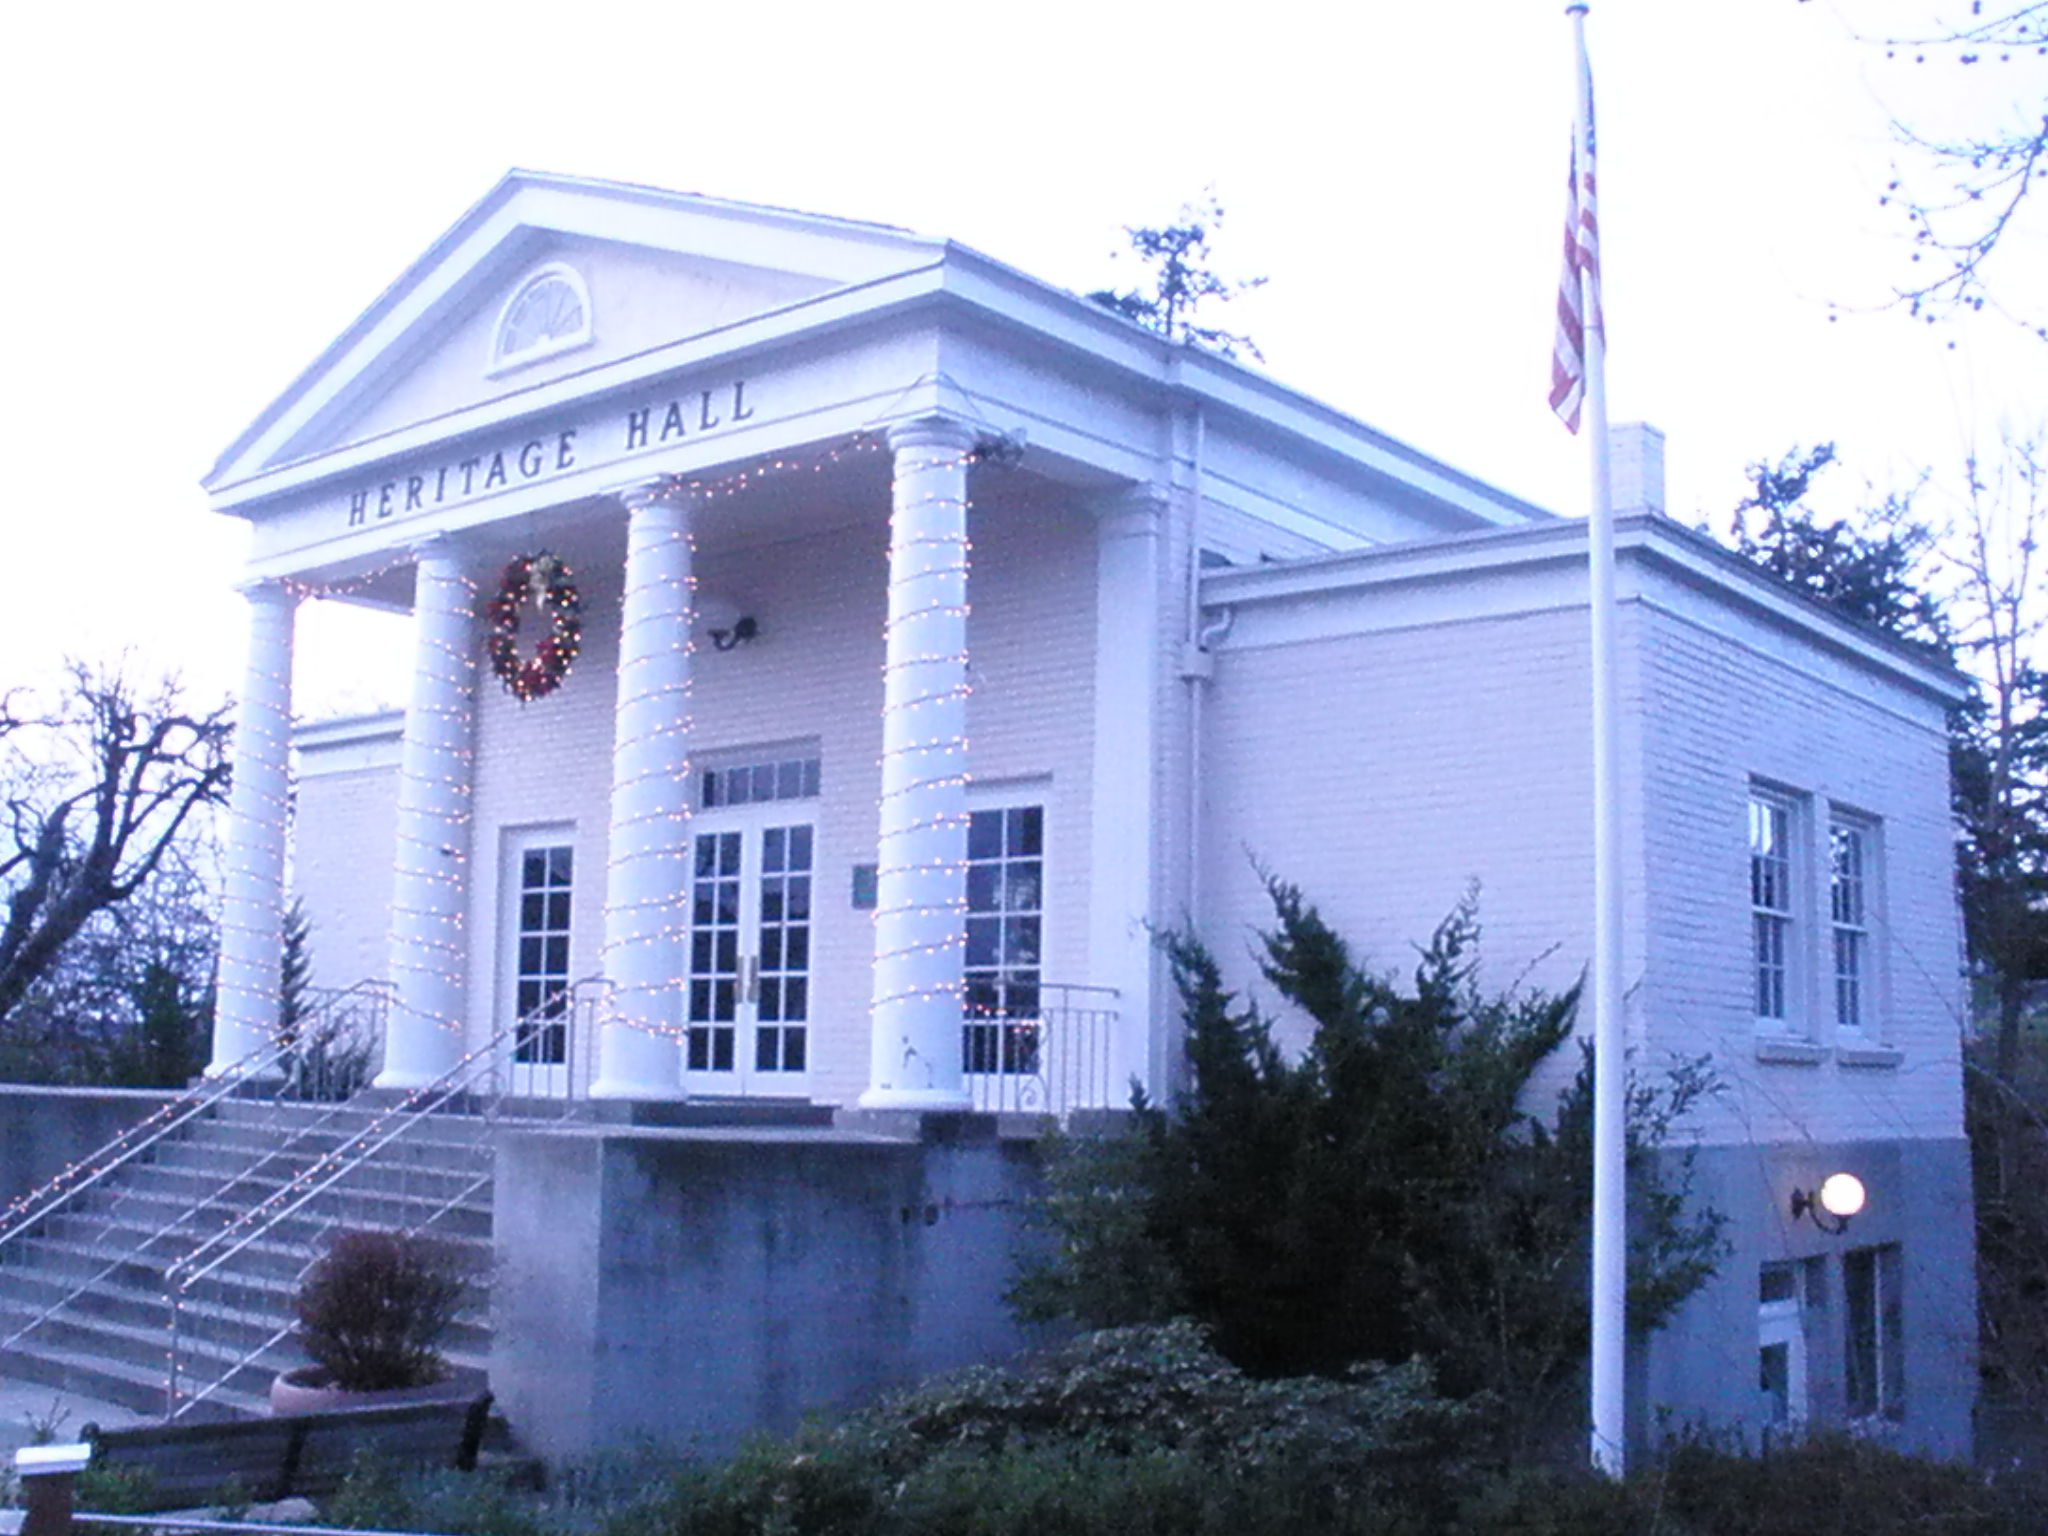 Lovely City Church Kirkland Wa #1: Heritage_Hall_Kirkland_Washington.jpg